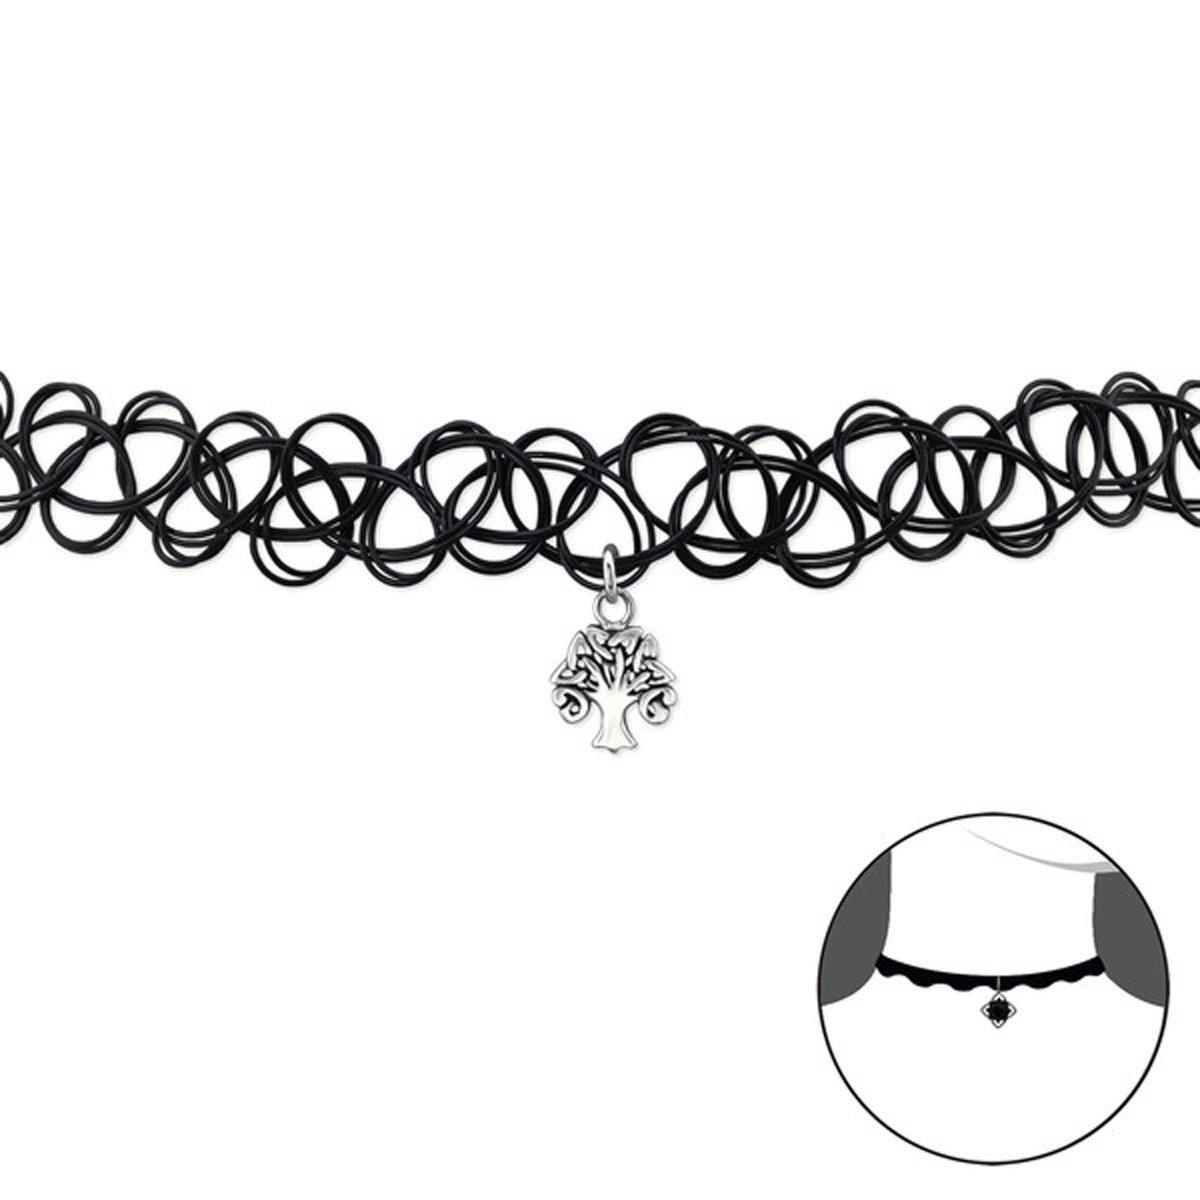 Celtic Tree Of Life Choker Necklace Black Stretch Sterling Silver 925 (E32968)